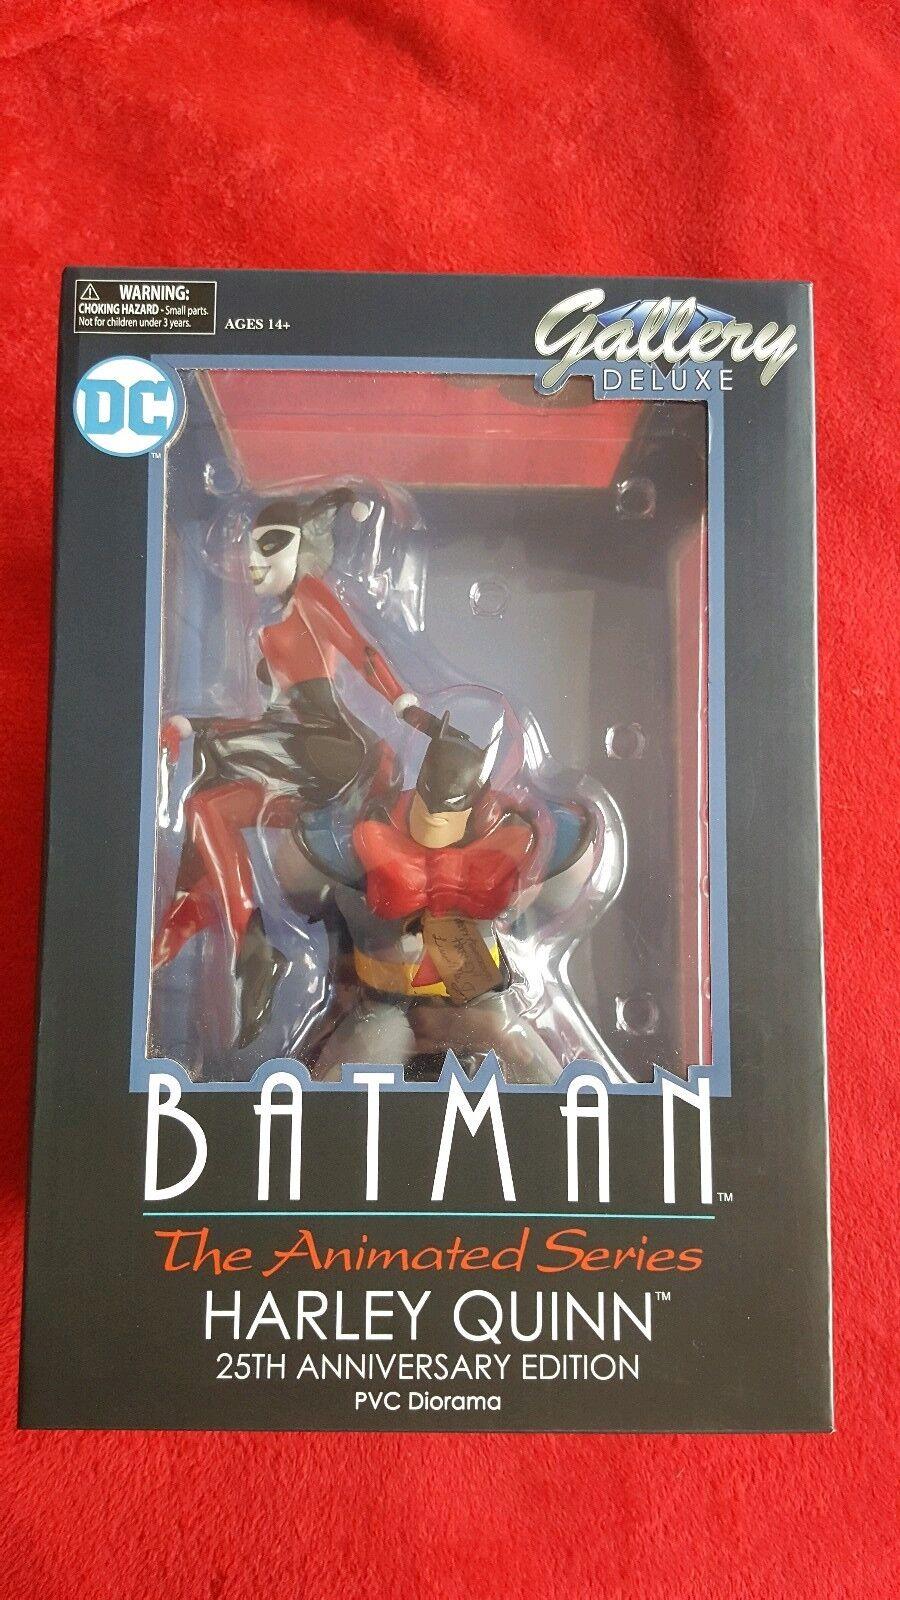 DC Gallery Deluxe Batman Harley Quinn 25th Anniversary Statue BRAND NEW